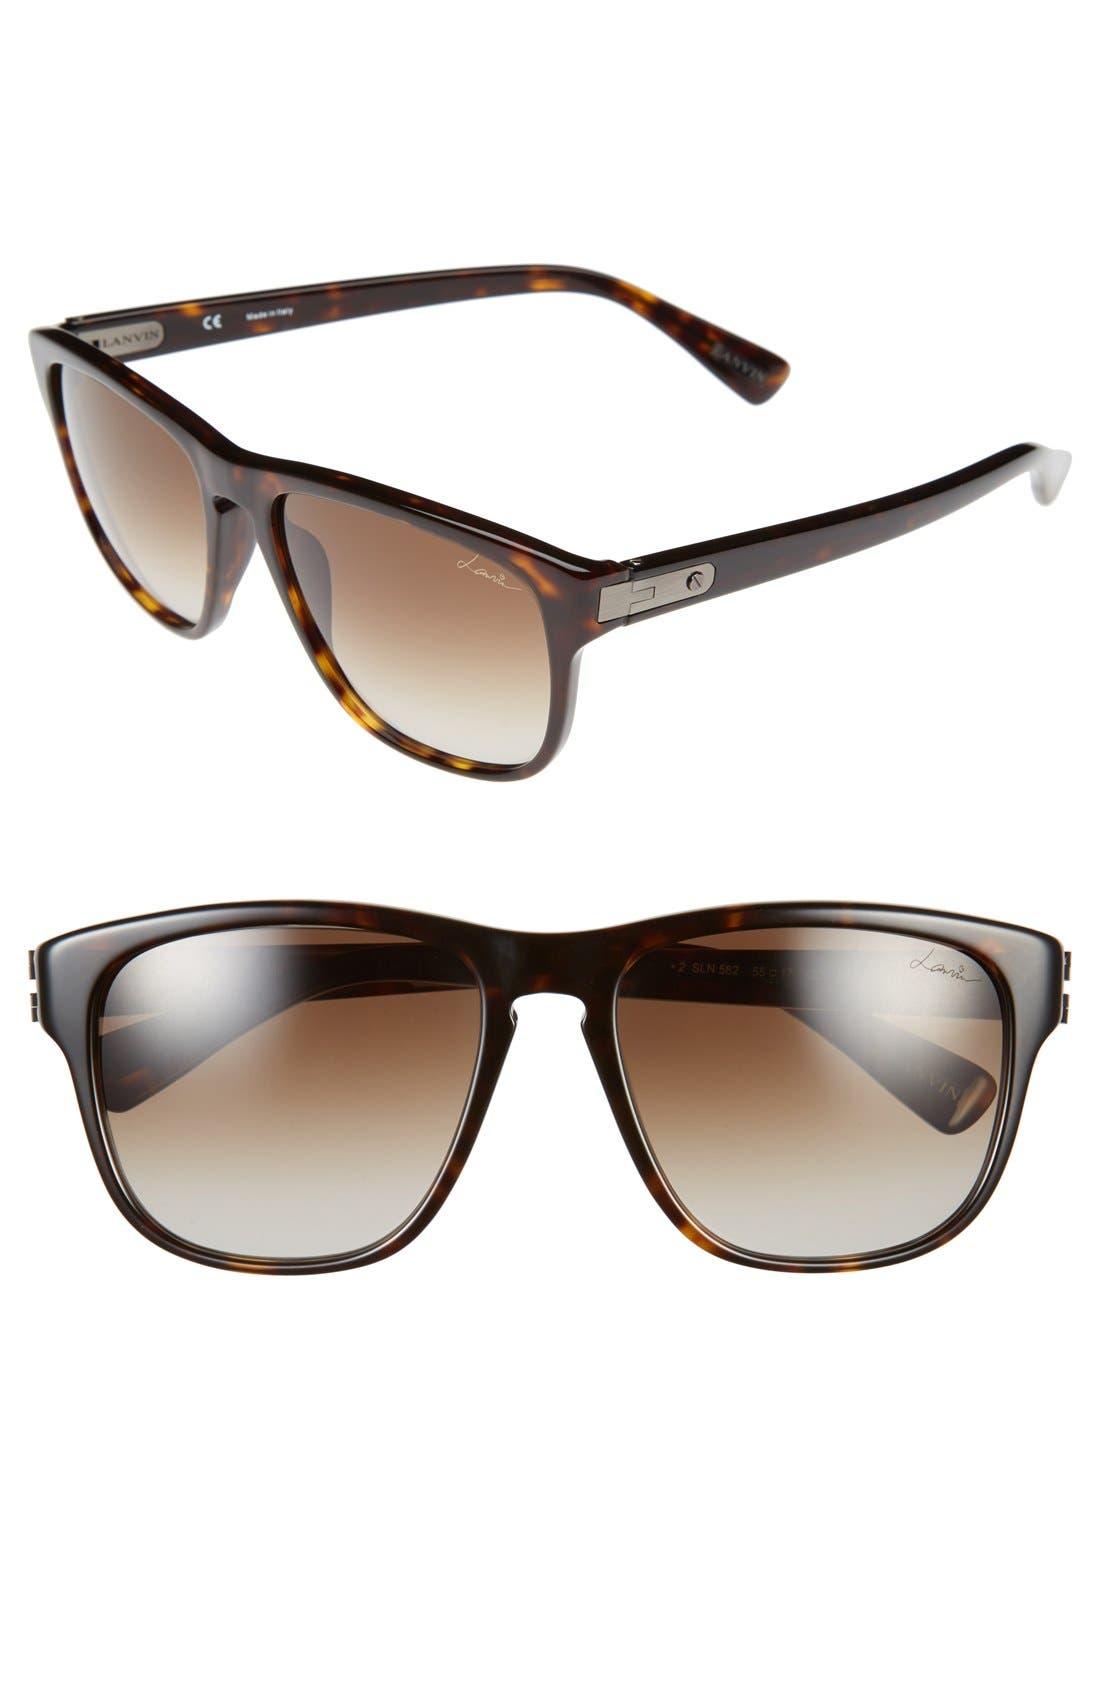 Main Image - Lanvin 55mm Retro Sunglasses